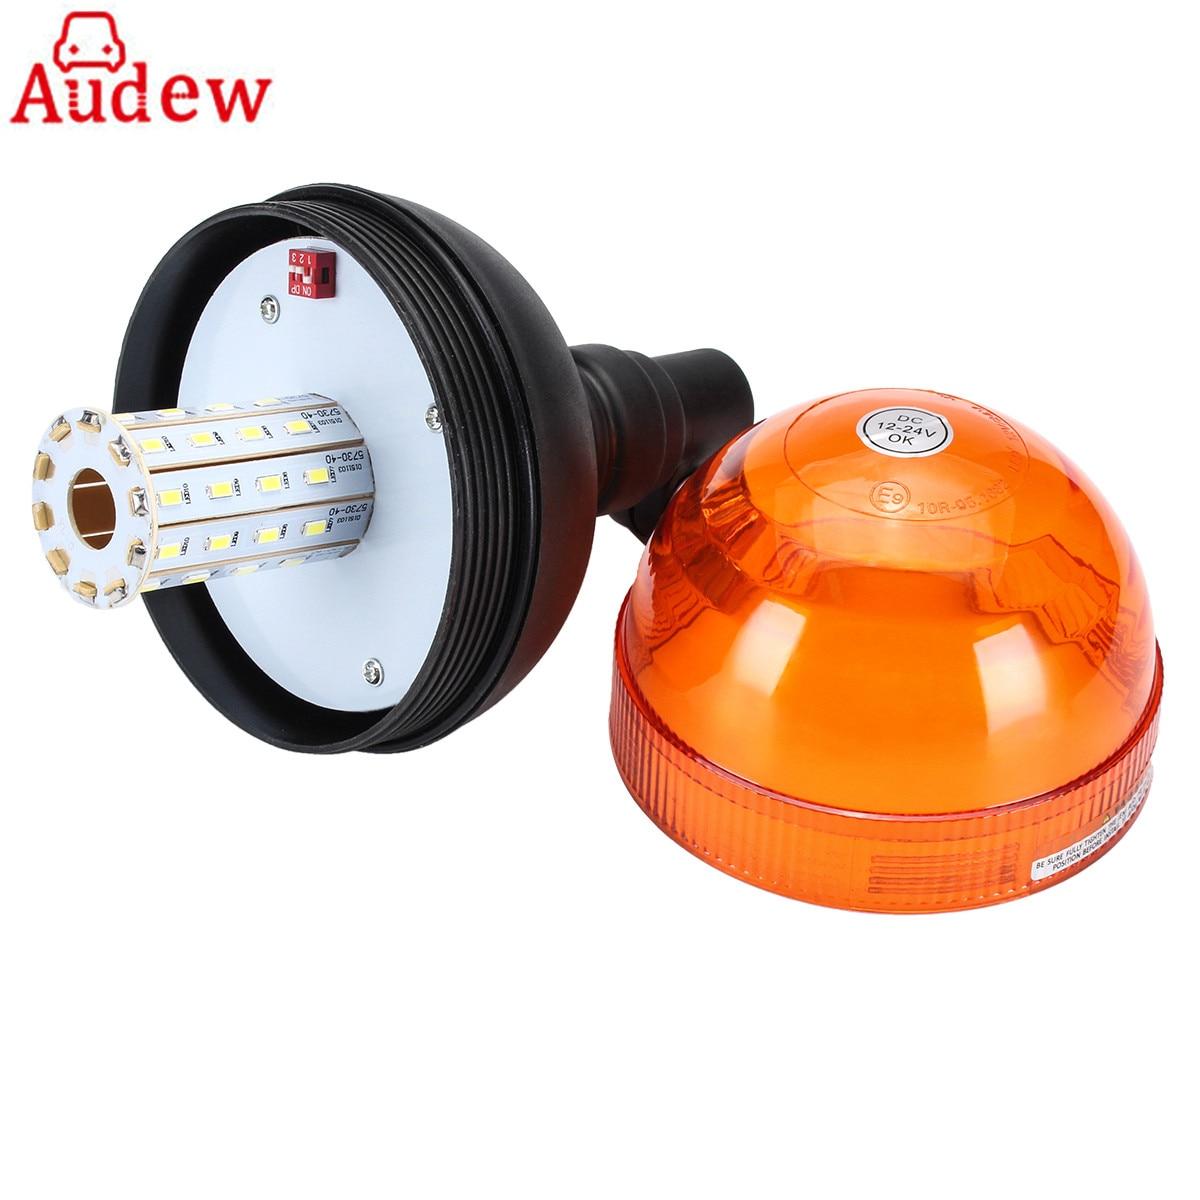 Tractor Safety Led Lights : Pcs car warning light led rotating flashing amber beacon